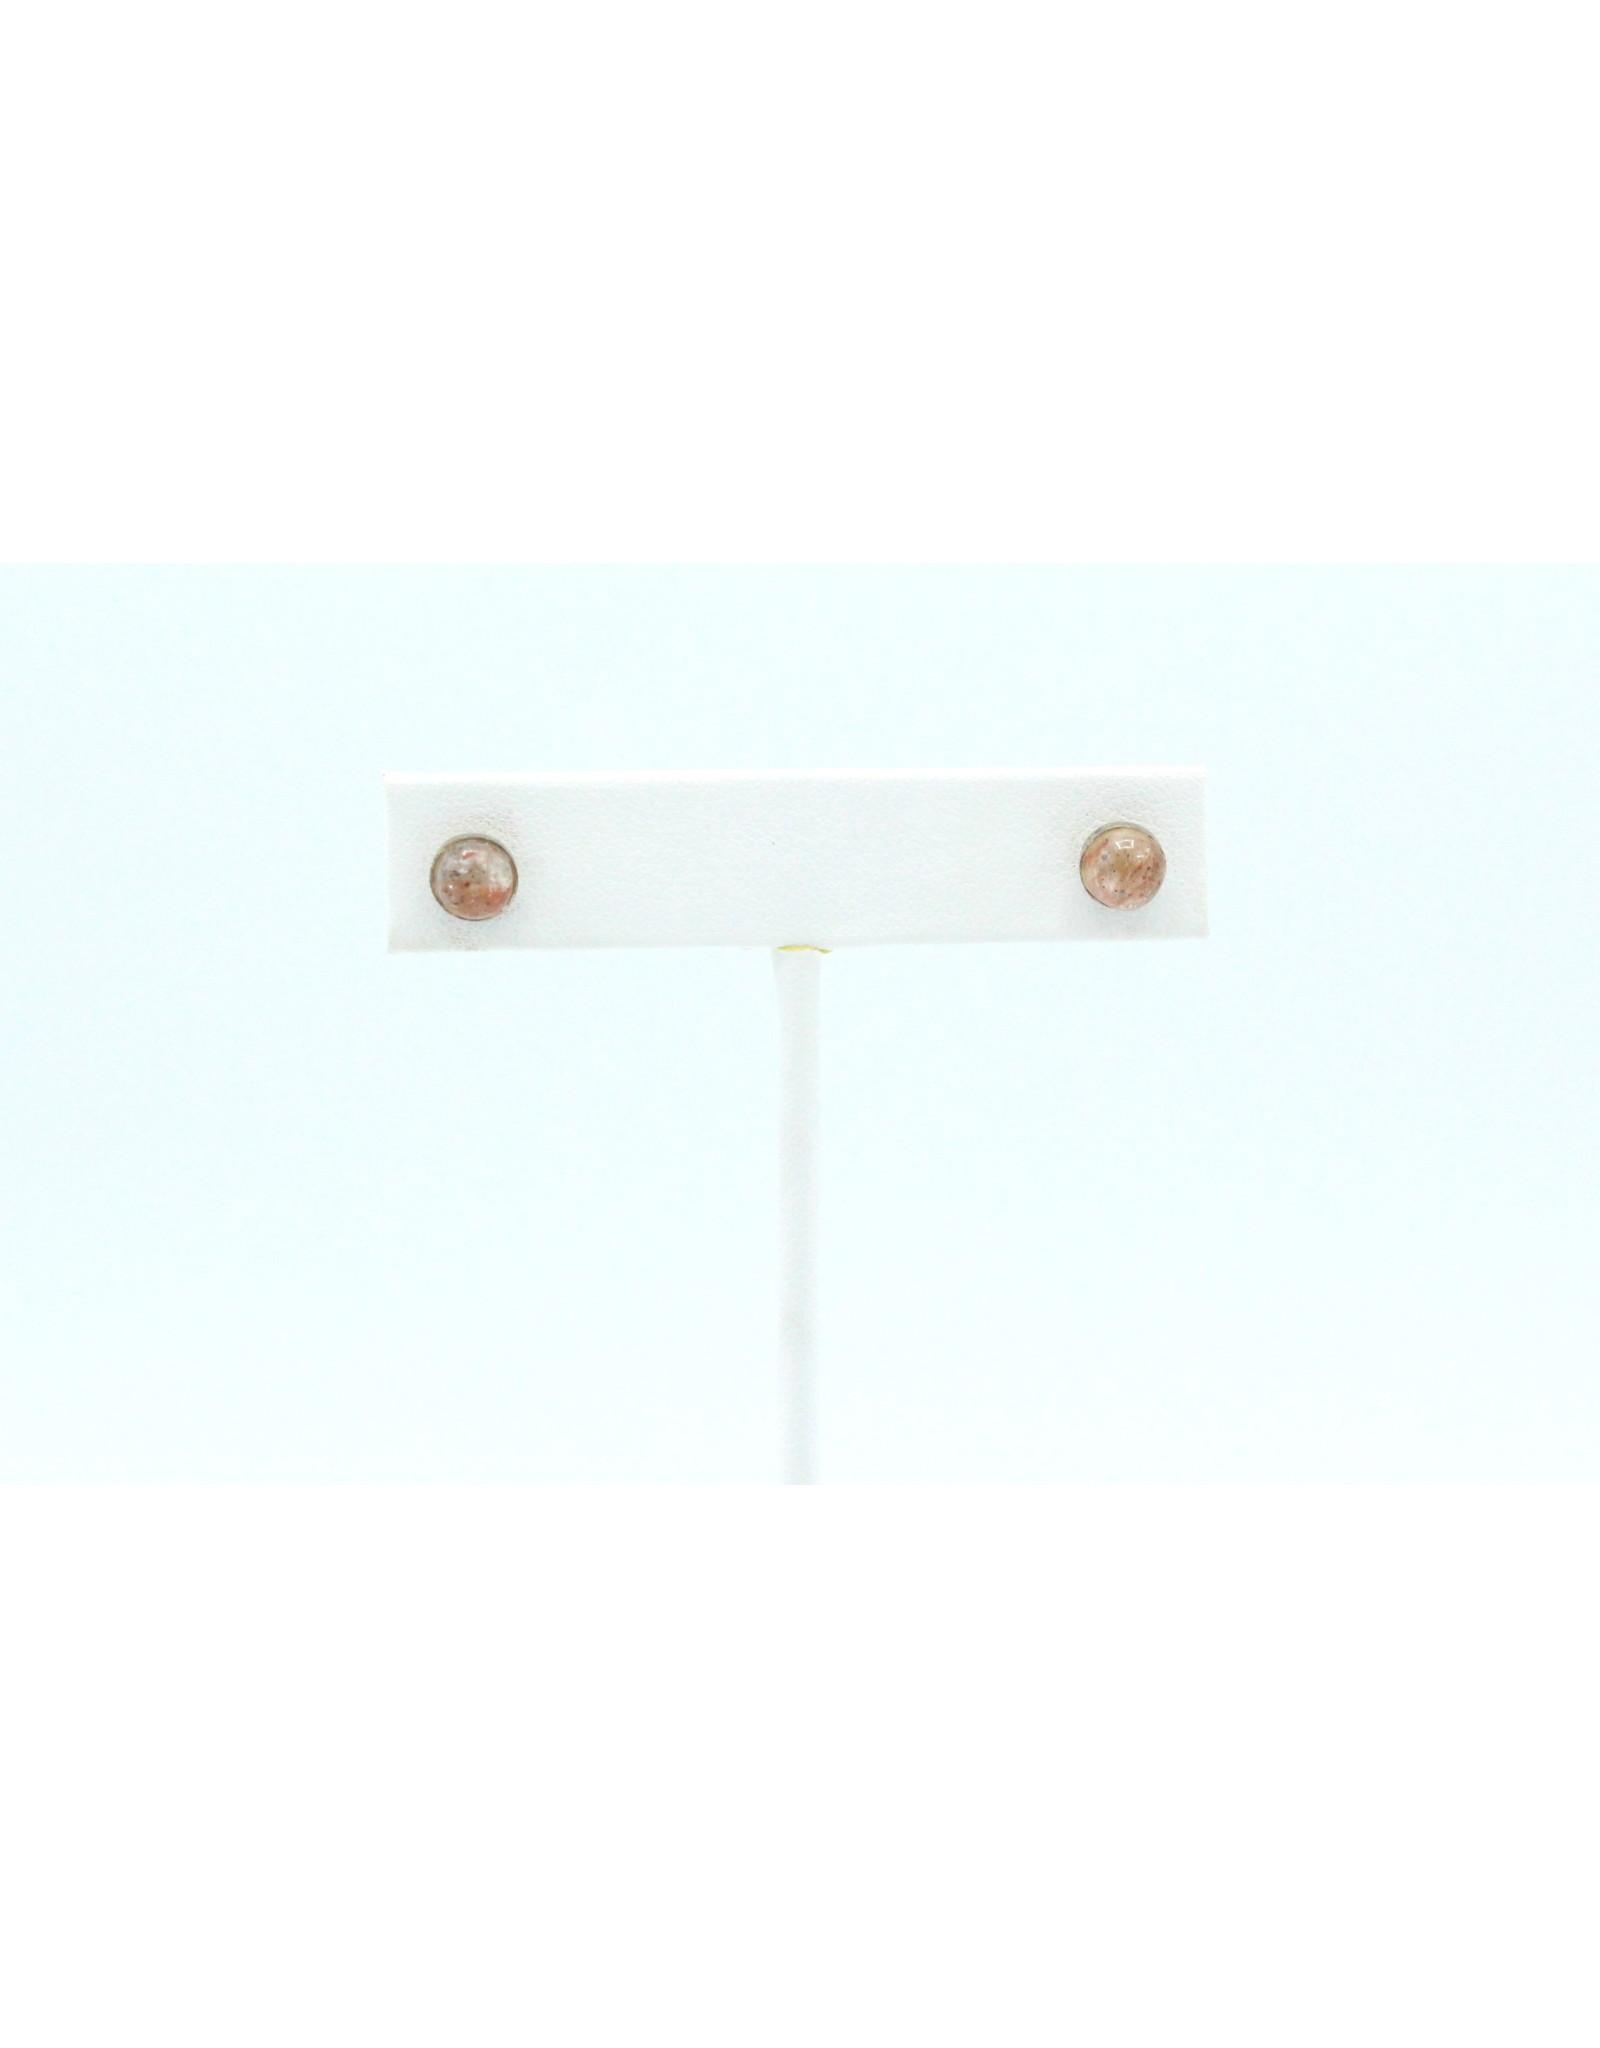 Quartz Addirondak Earrings - EQA01